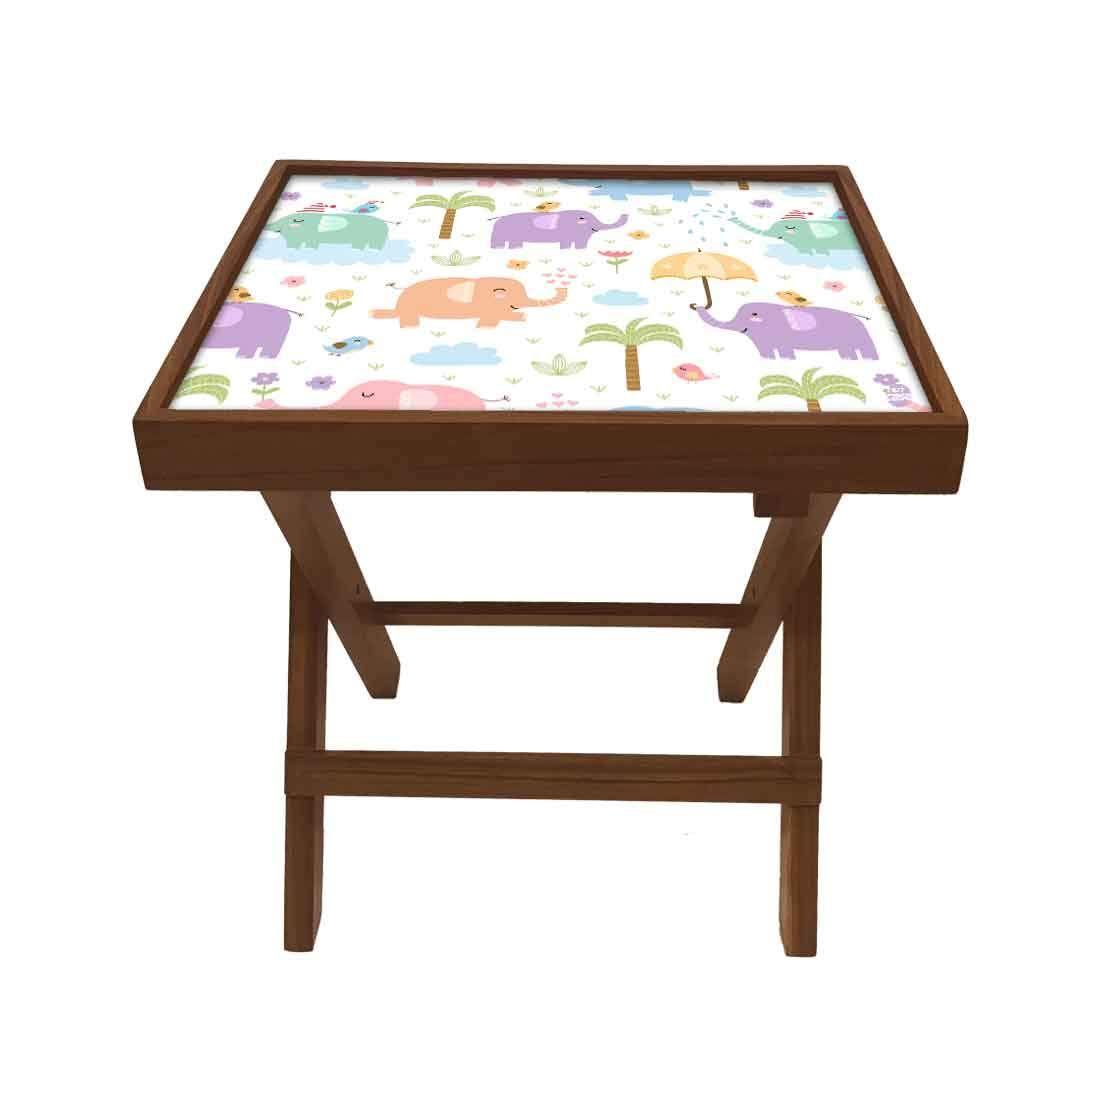 Nutcase Designer Teak Wood Side Table Folding Wooden Bedside Kids Baby Nursery Furniture Fun And In 2020 Teak Wood Side Table Side Table Wood Baby Nursery Furniture